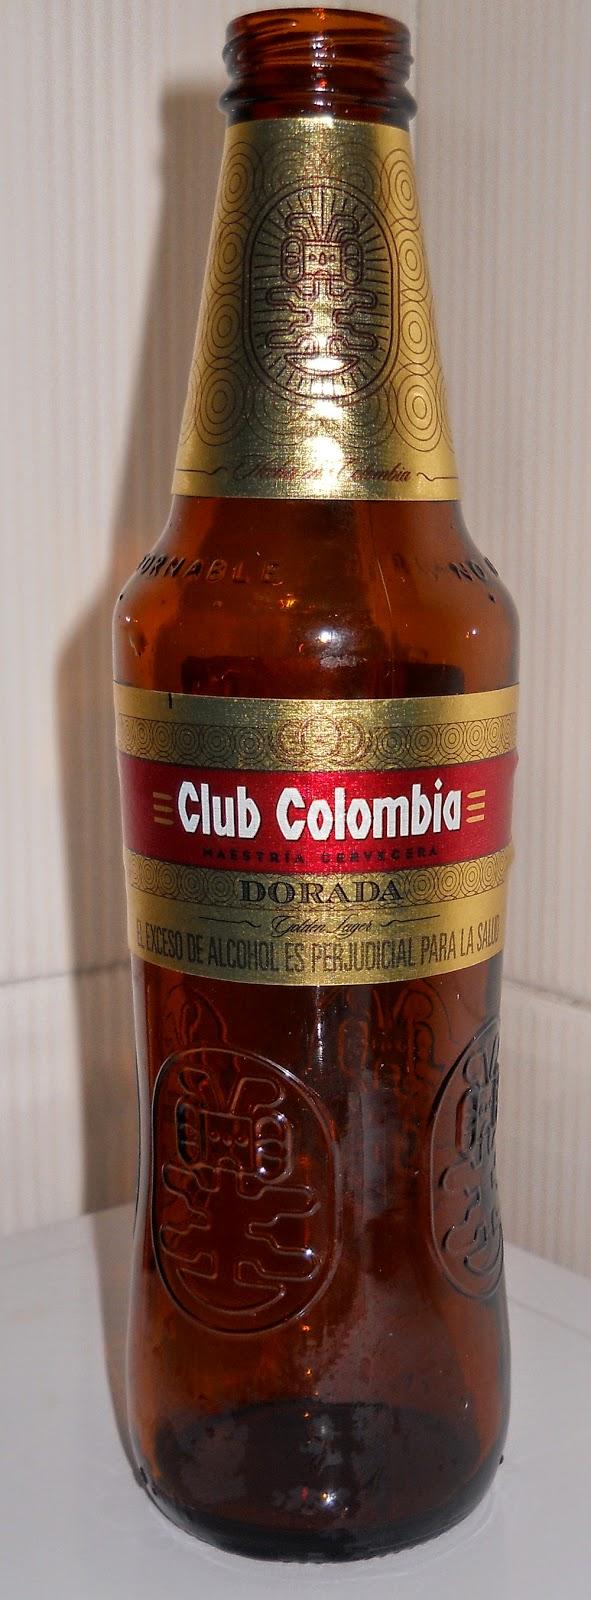 cerveza colombiana Club Colombia Dorada